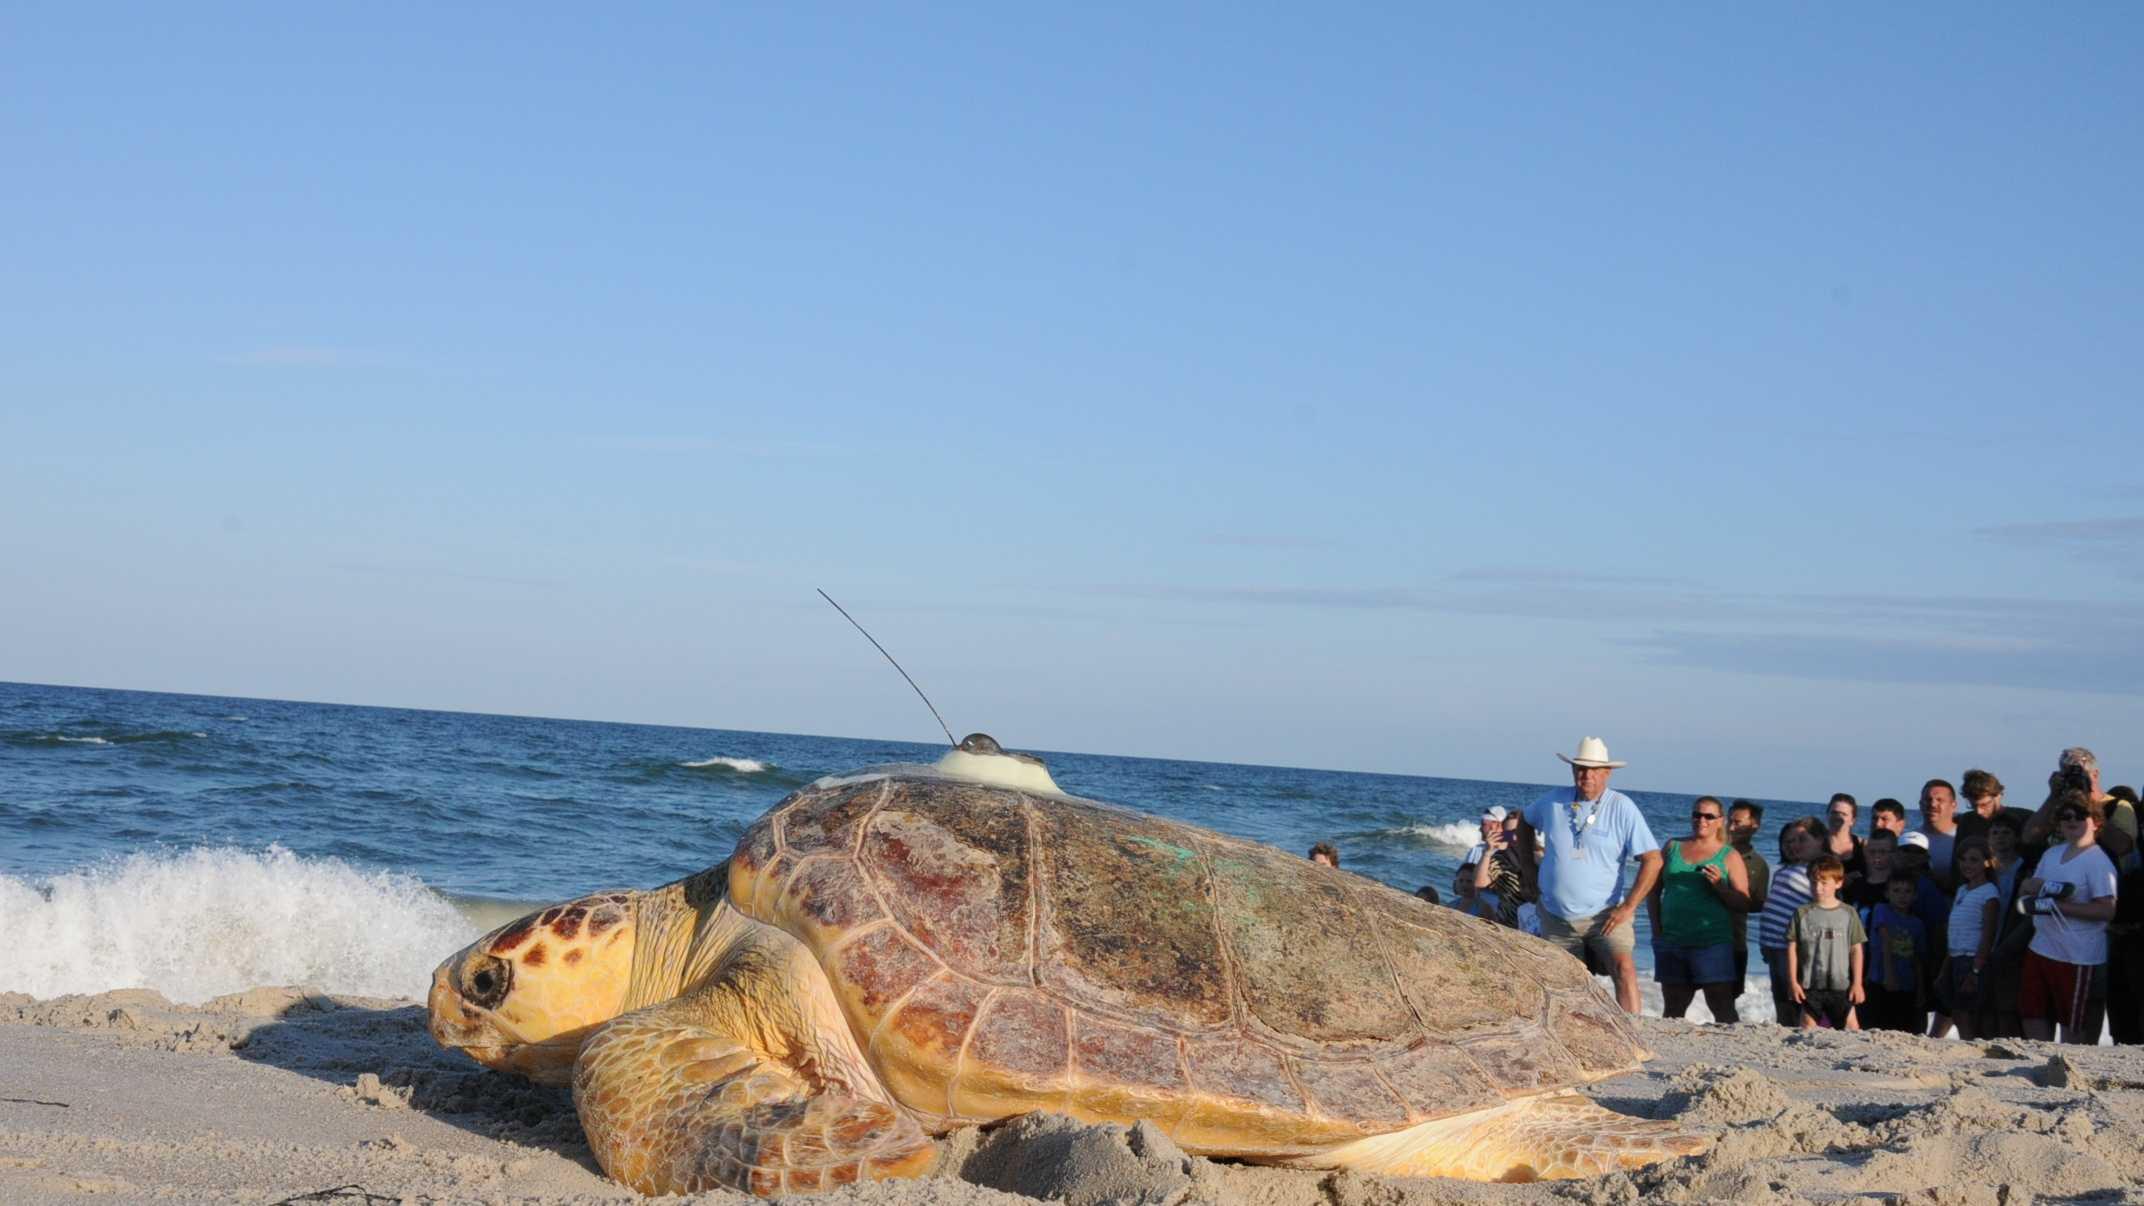 Loggerhead turtle release in VA 01 0624.jpg